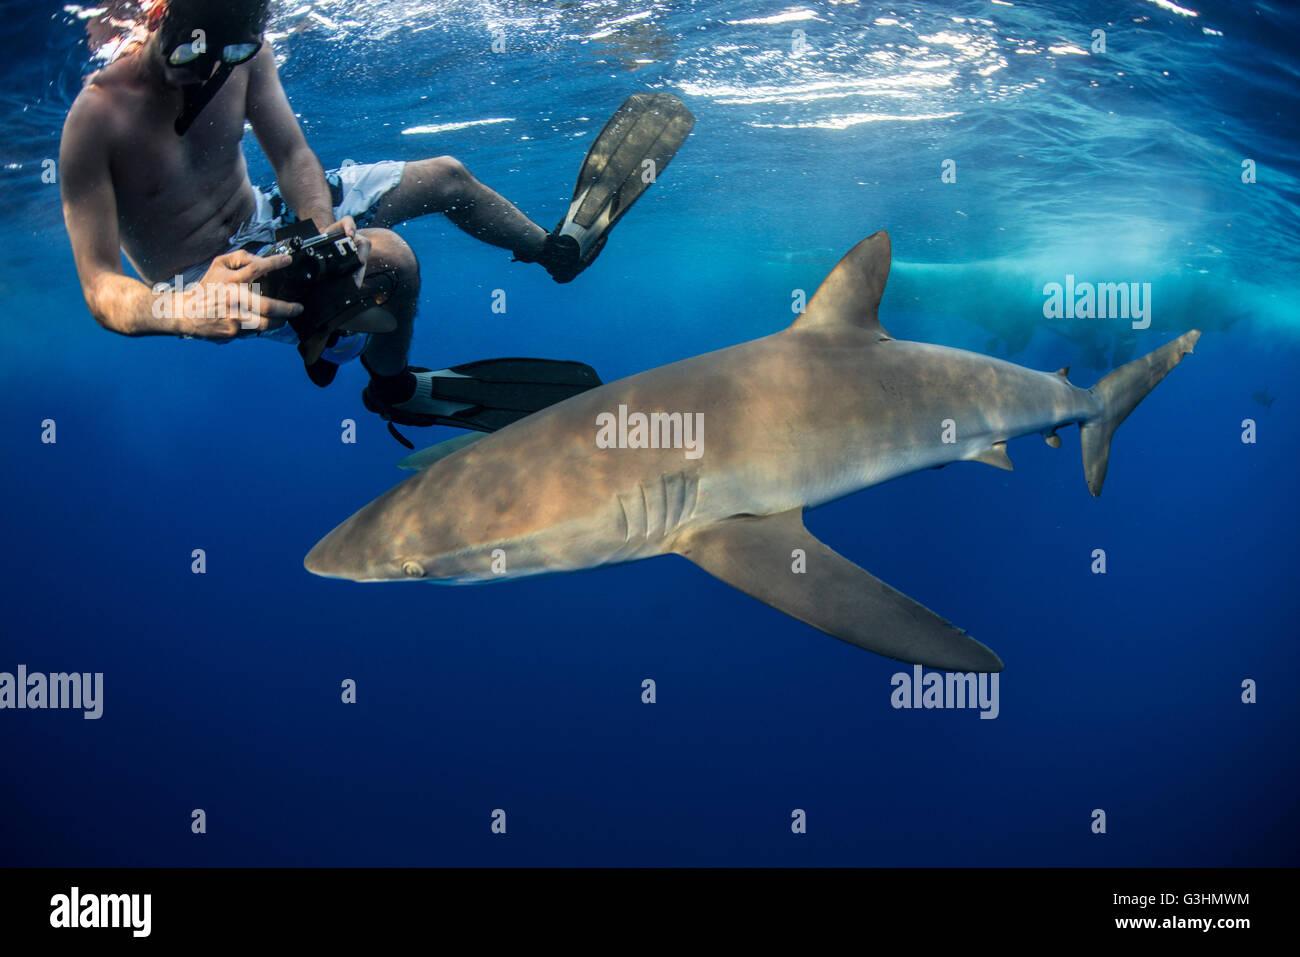 Snorkeler photographing a silky shark (Carcharhinus falciformis), Roca Partida, Colima, Mexico - Stock Image